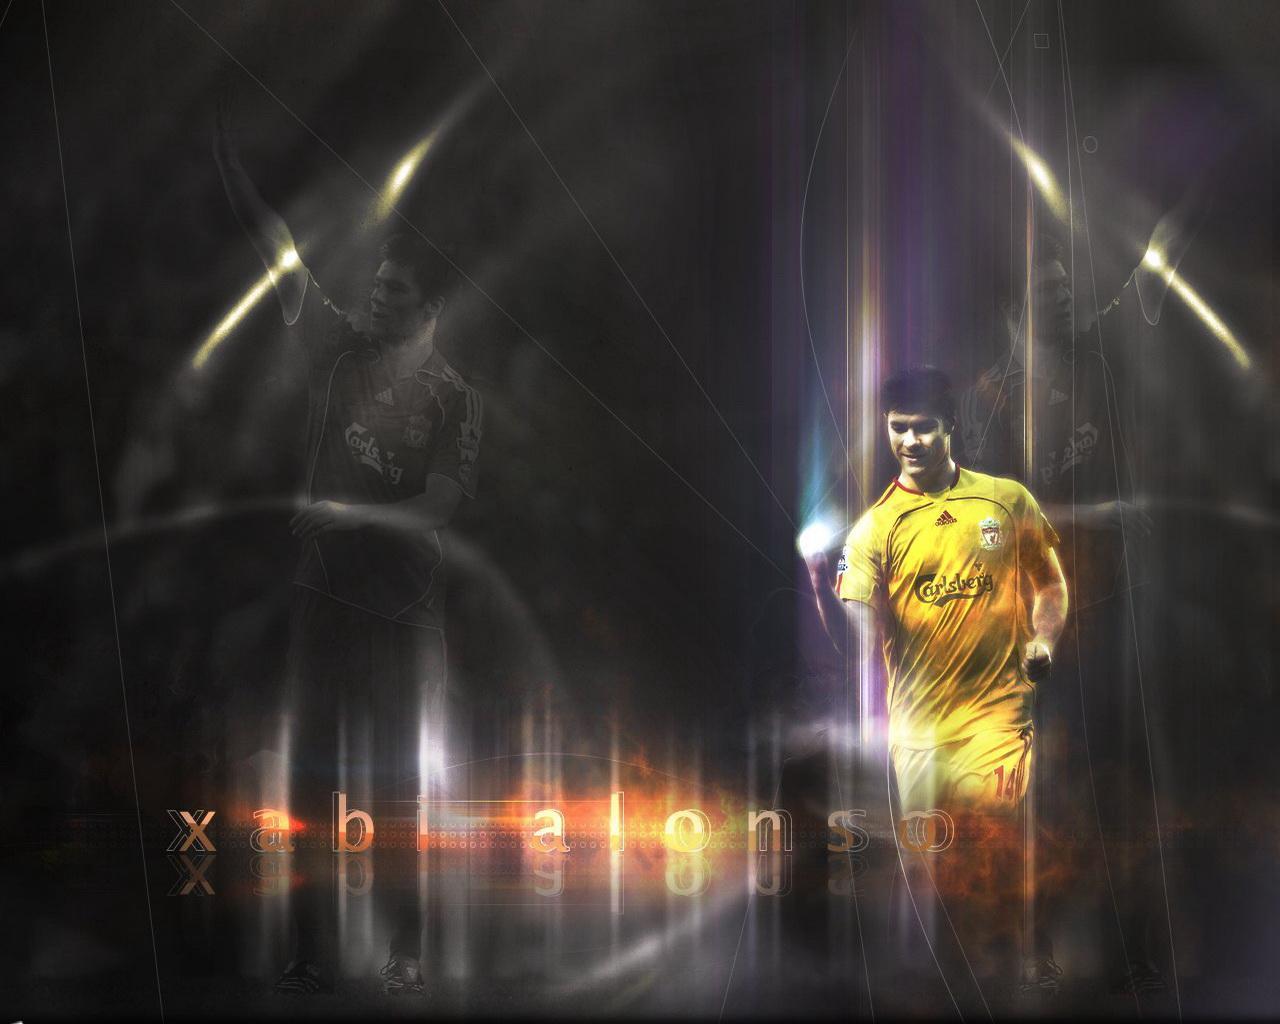 Xabi Alonso (95)